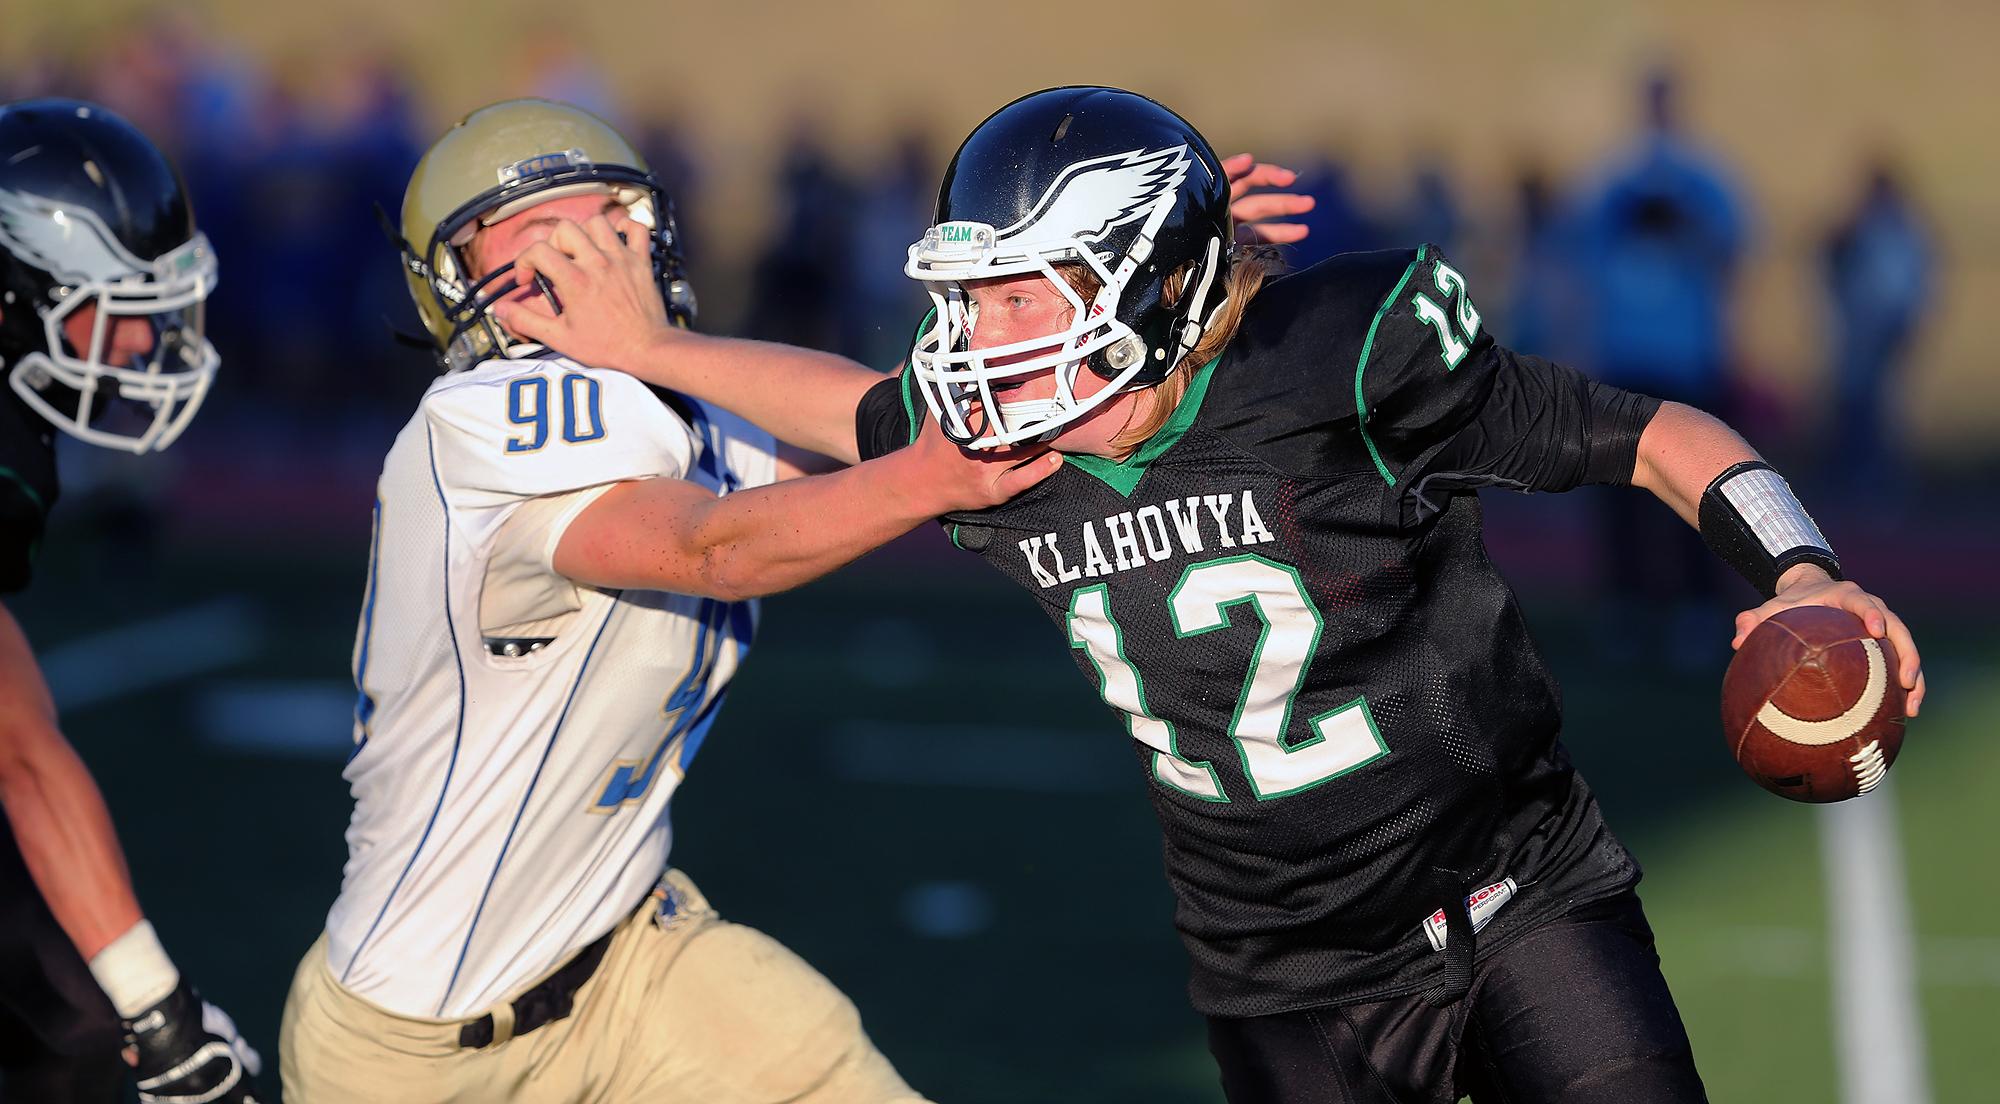 Klahowya quarterback George Harris escapes Ethan Nolting on a sack. LARRY STEAGALL / KITSAP SUN